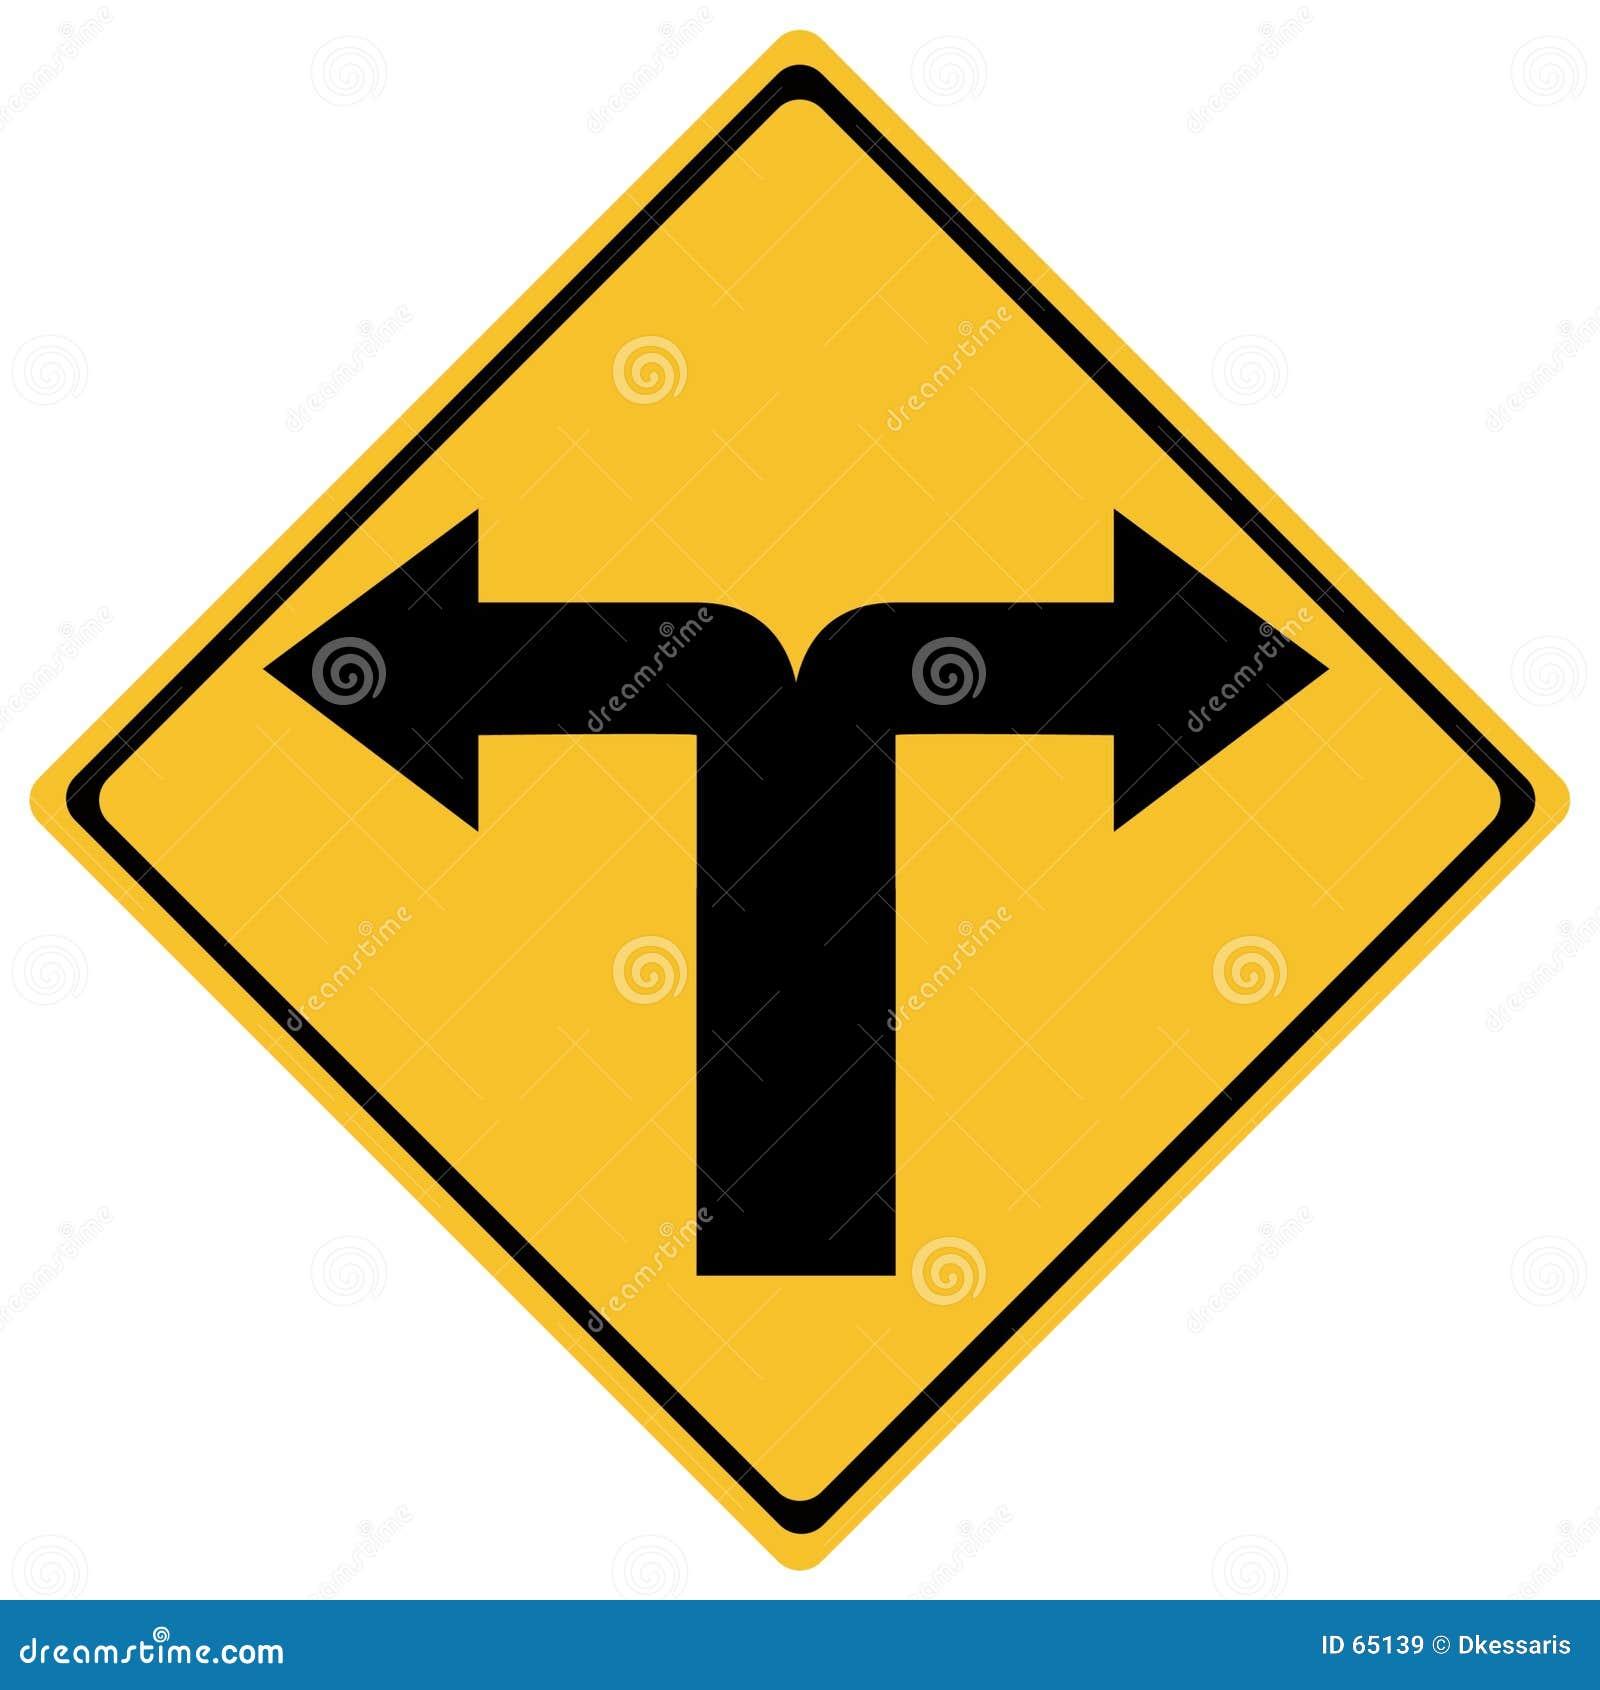 Traffic sign